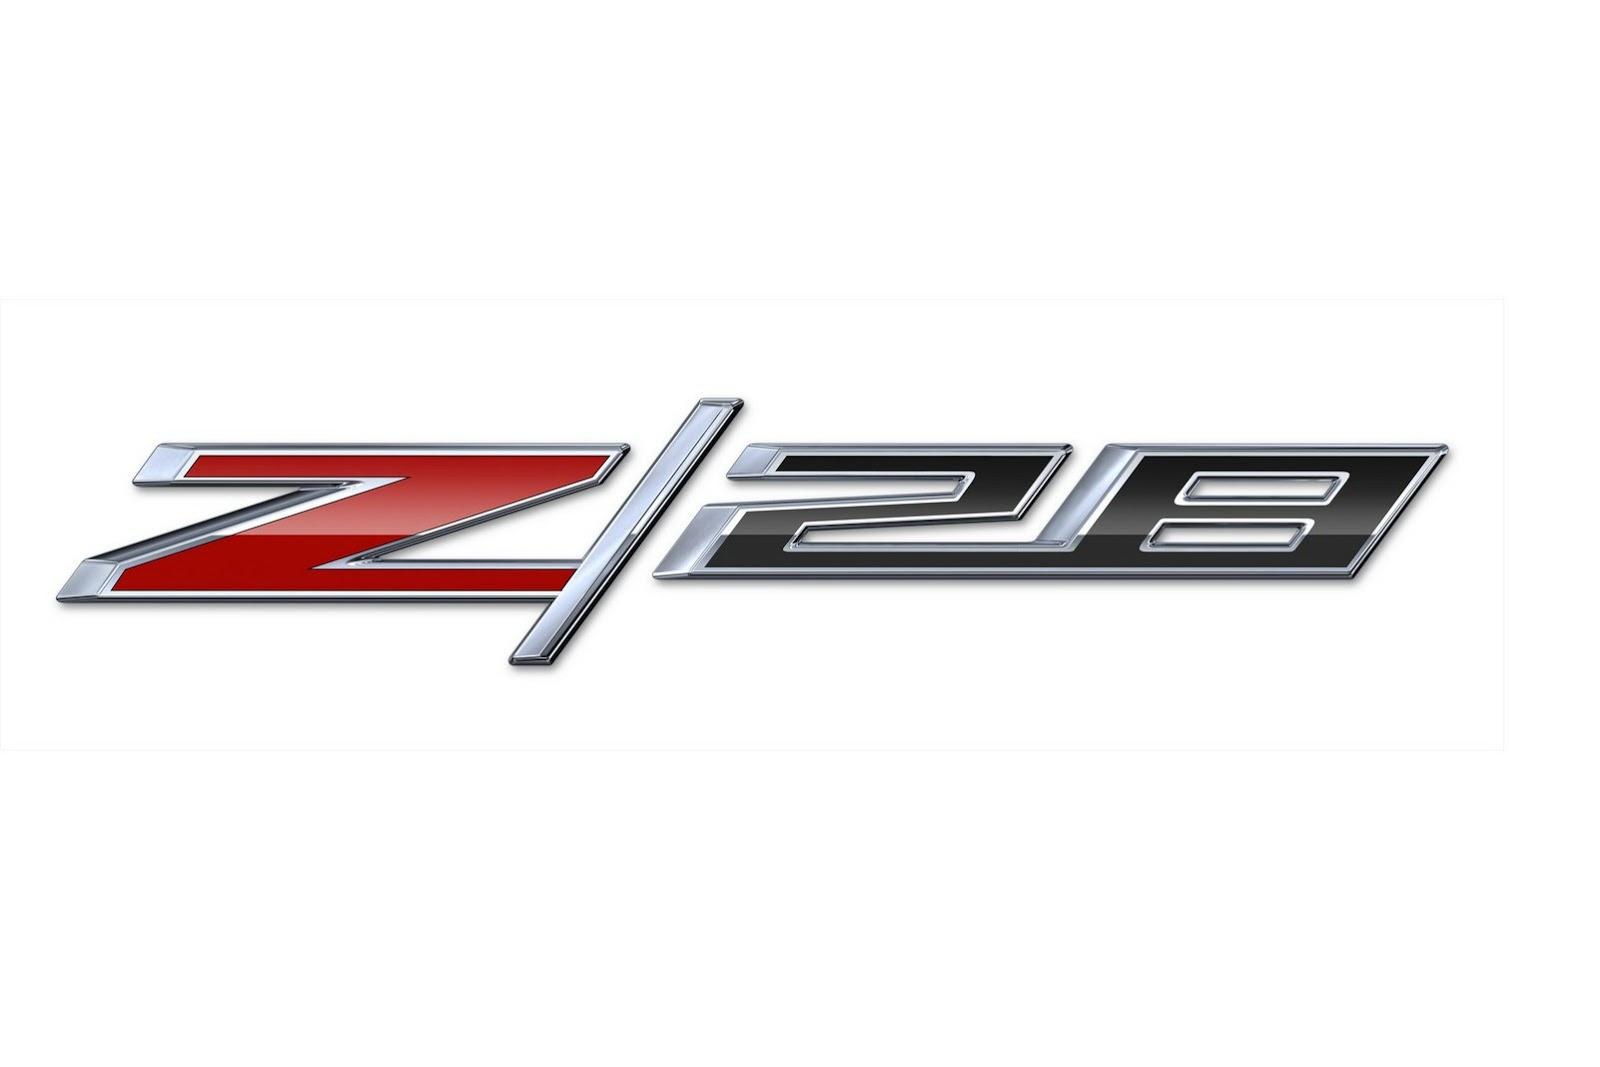 2014 Chevrolet Camaro Z28 Logo HD Wall Wallpapers   HD Wall Wallpapers 1600x1067